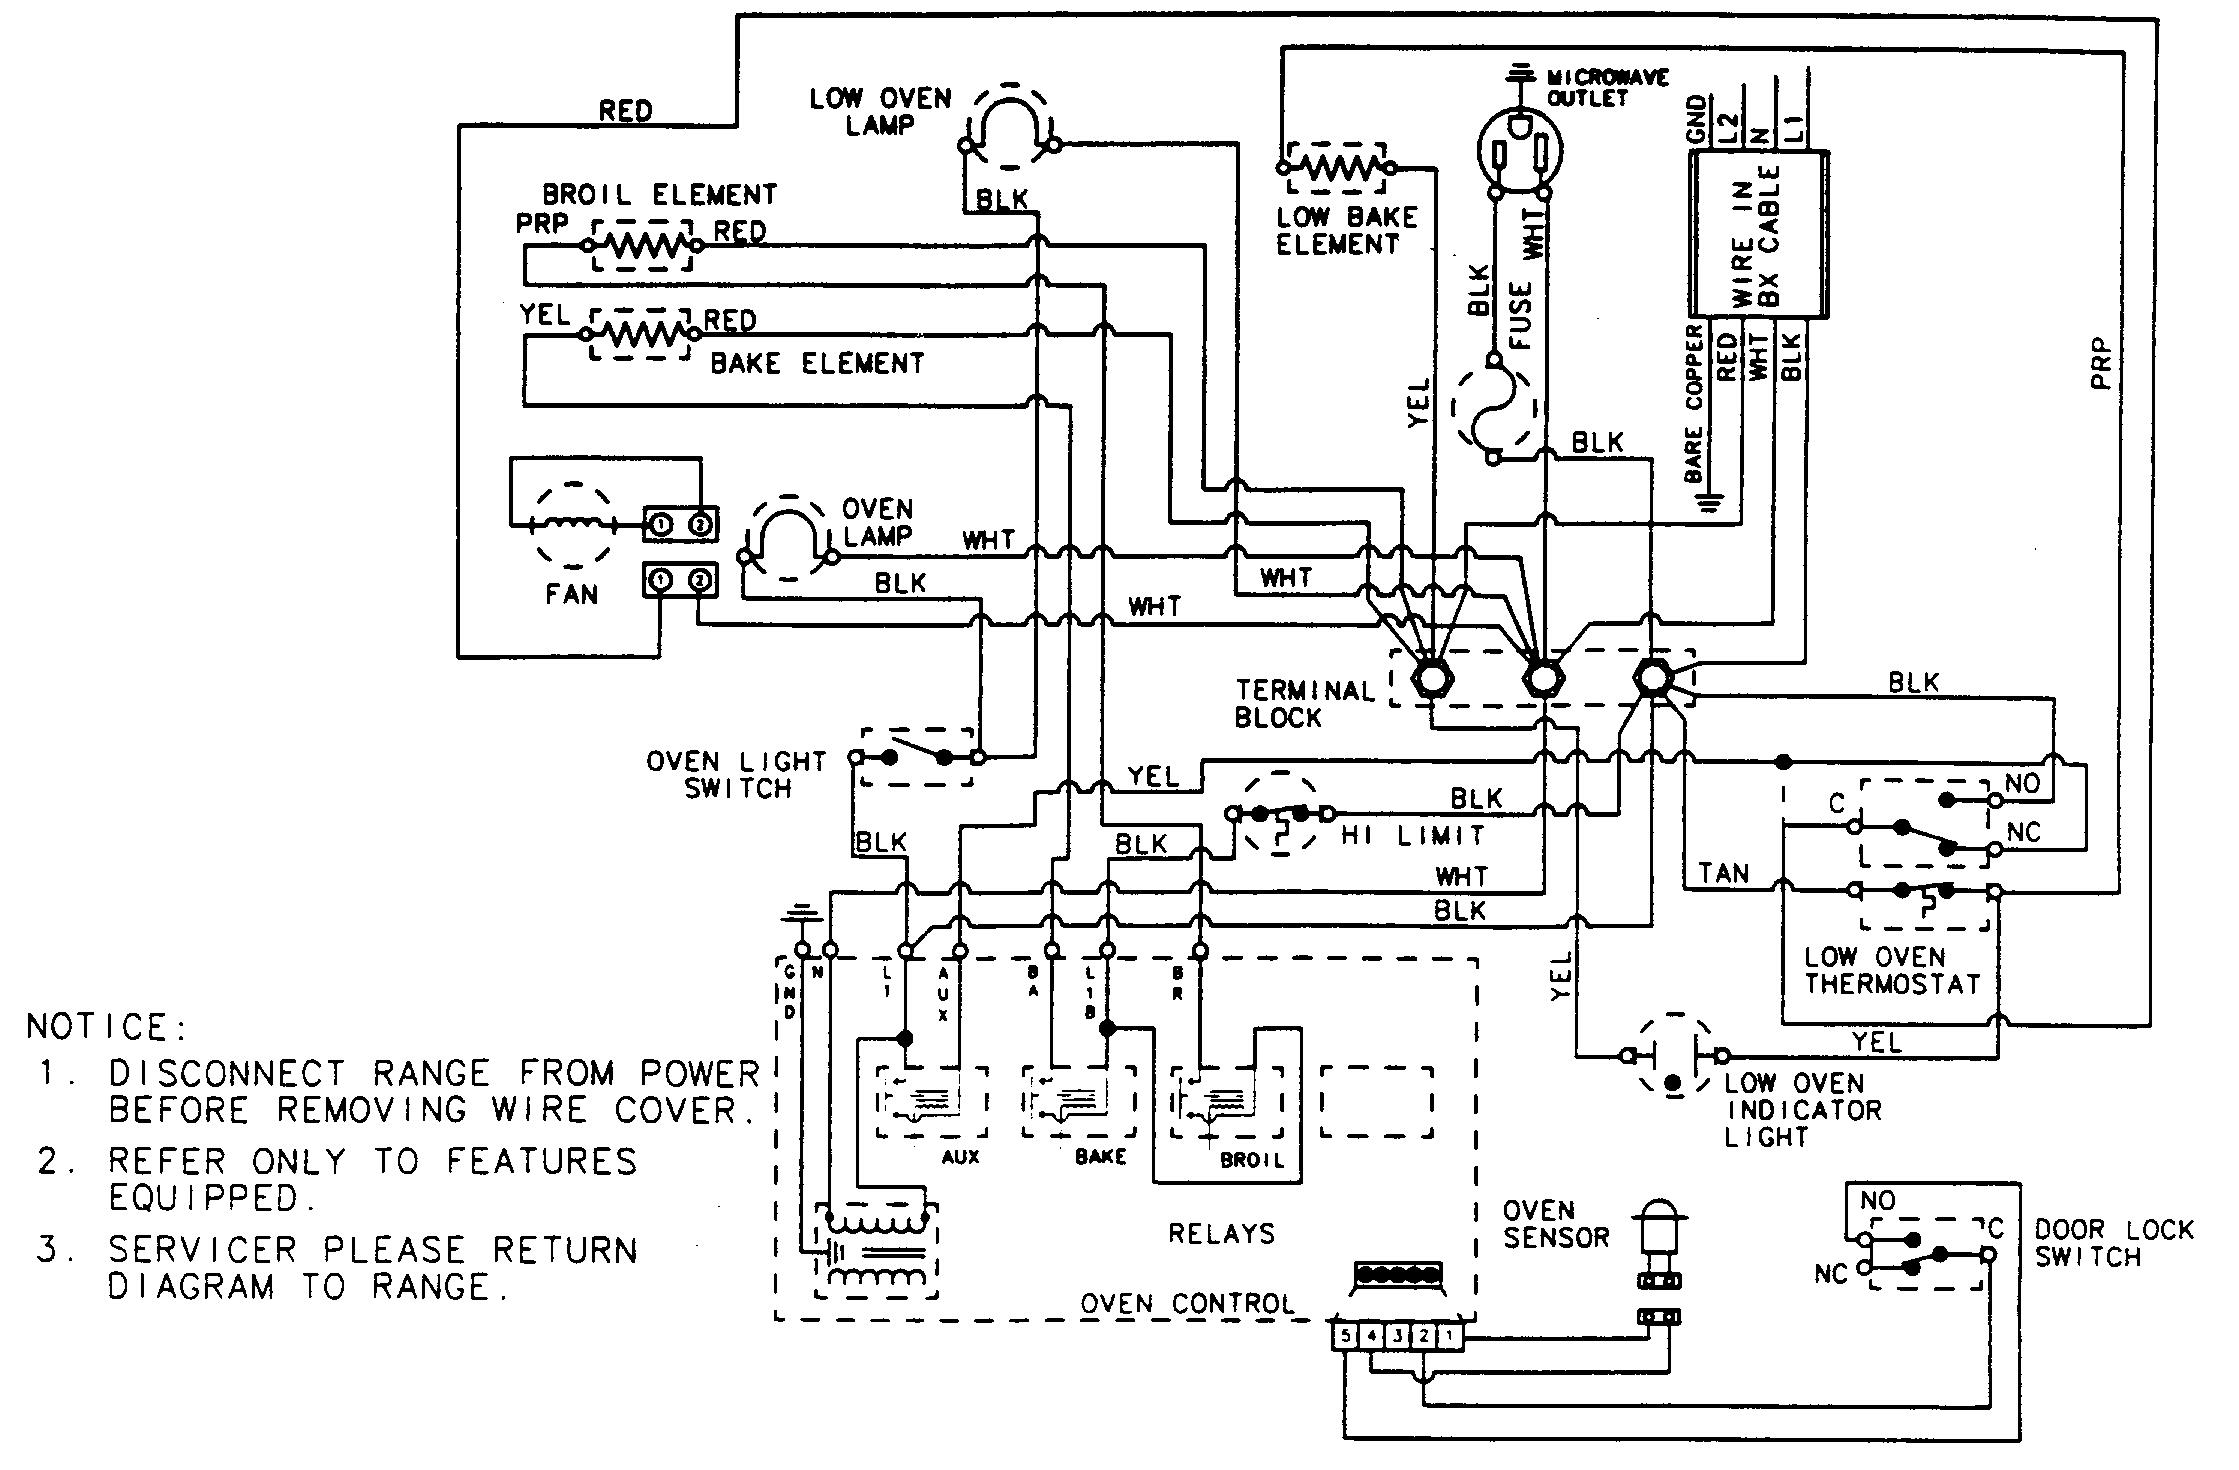 con gas oven wiring diagram